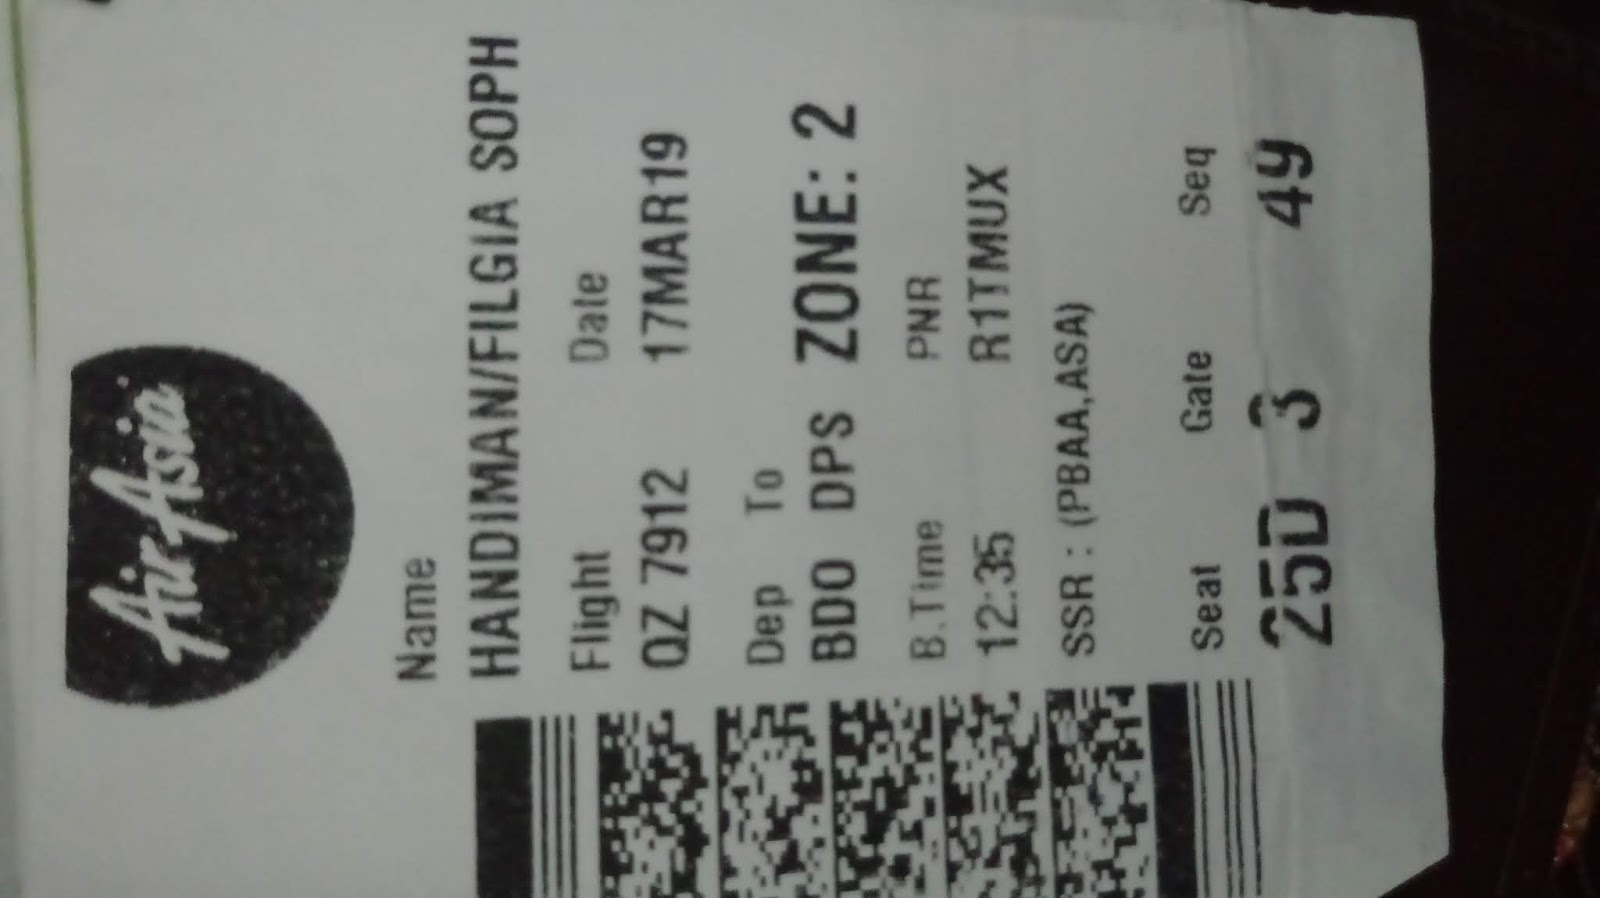 20190322 175705 - Jenis Font Boarding Pass Lion Air